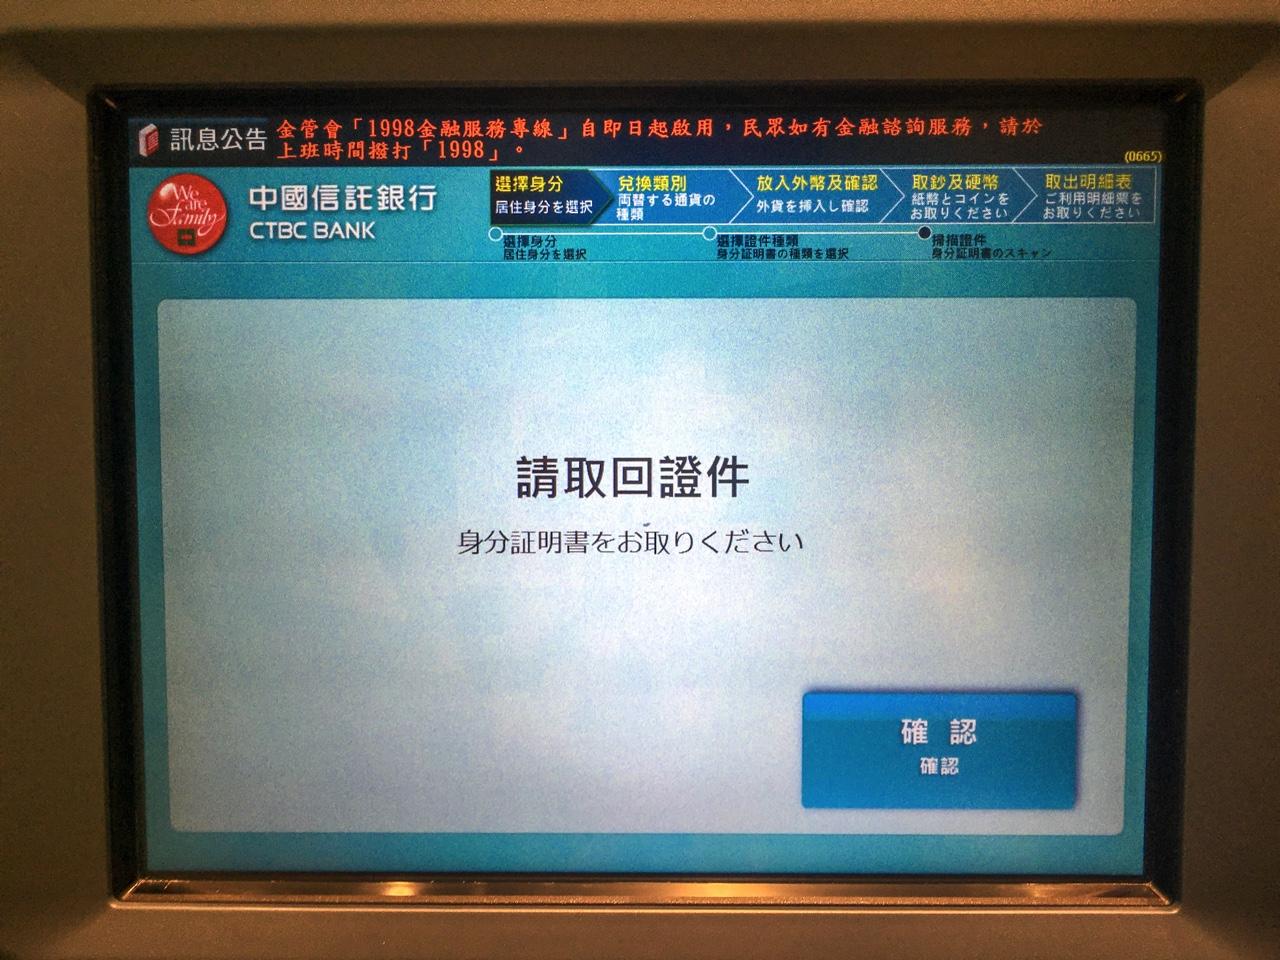 自動外貨両替機の画面04